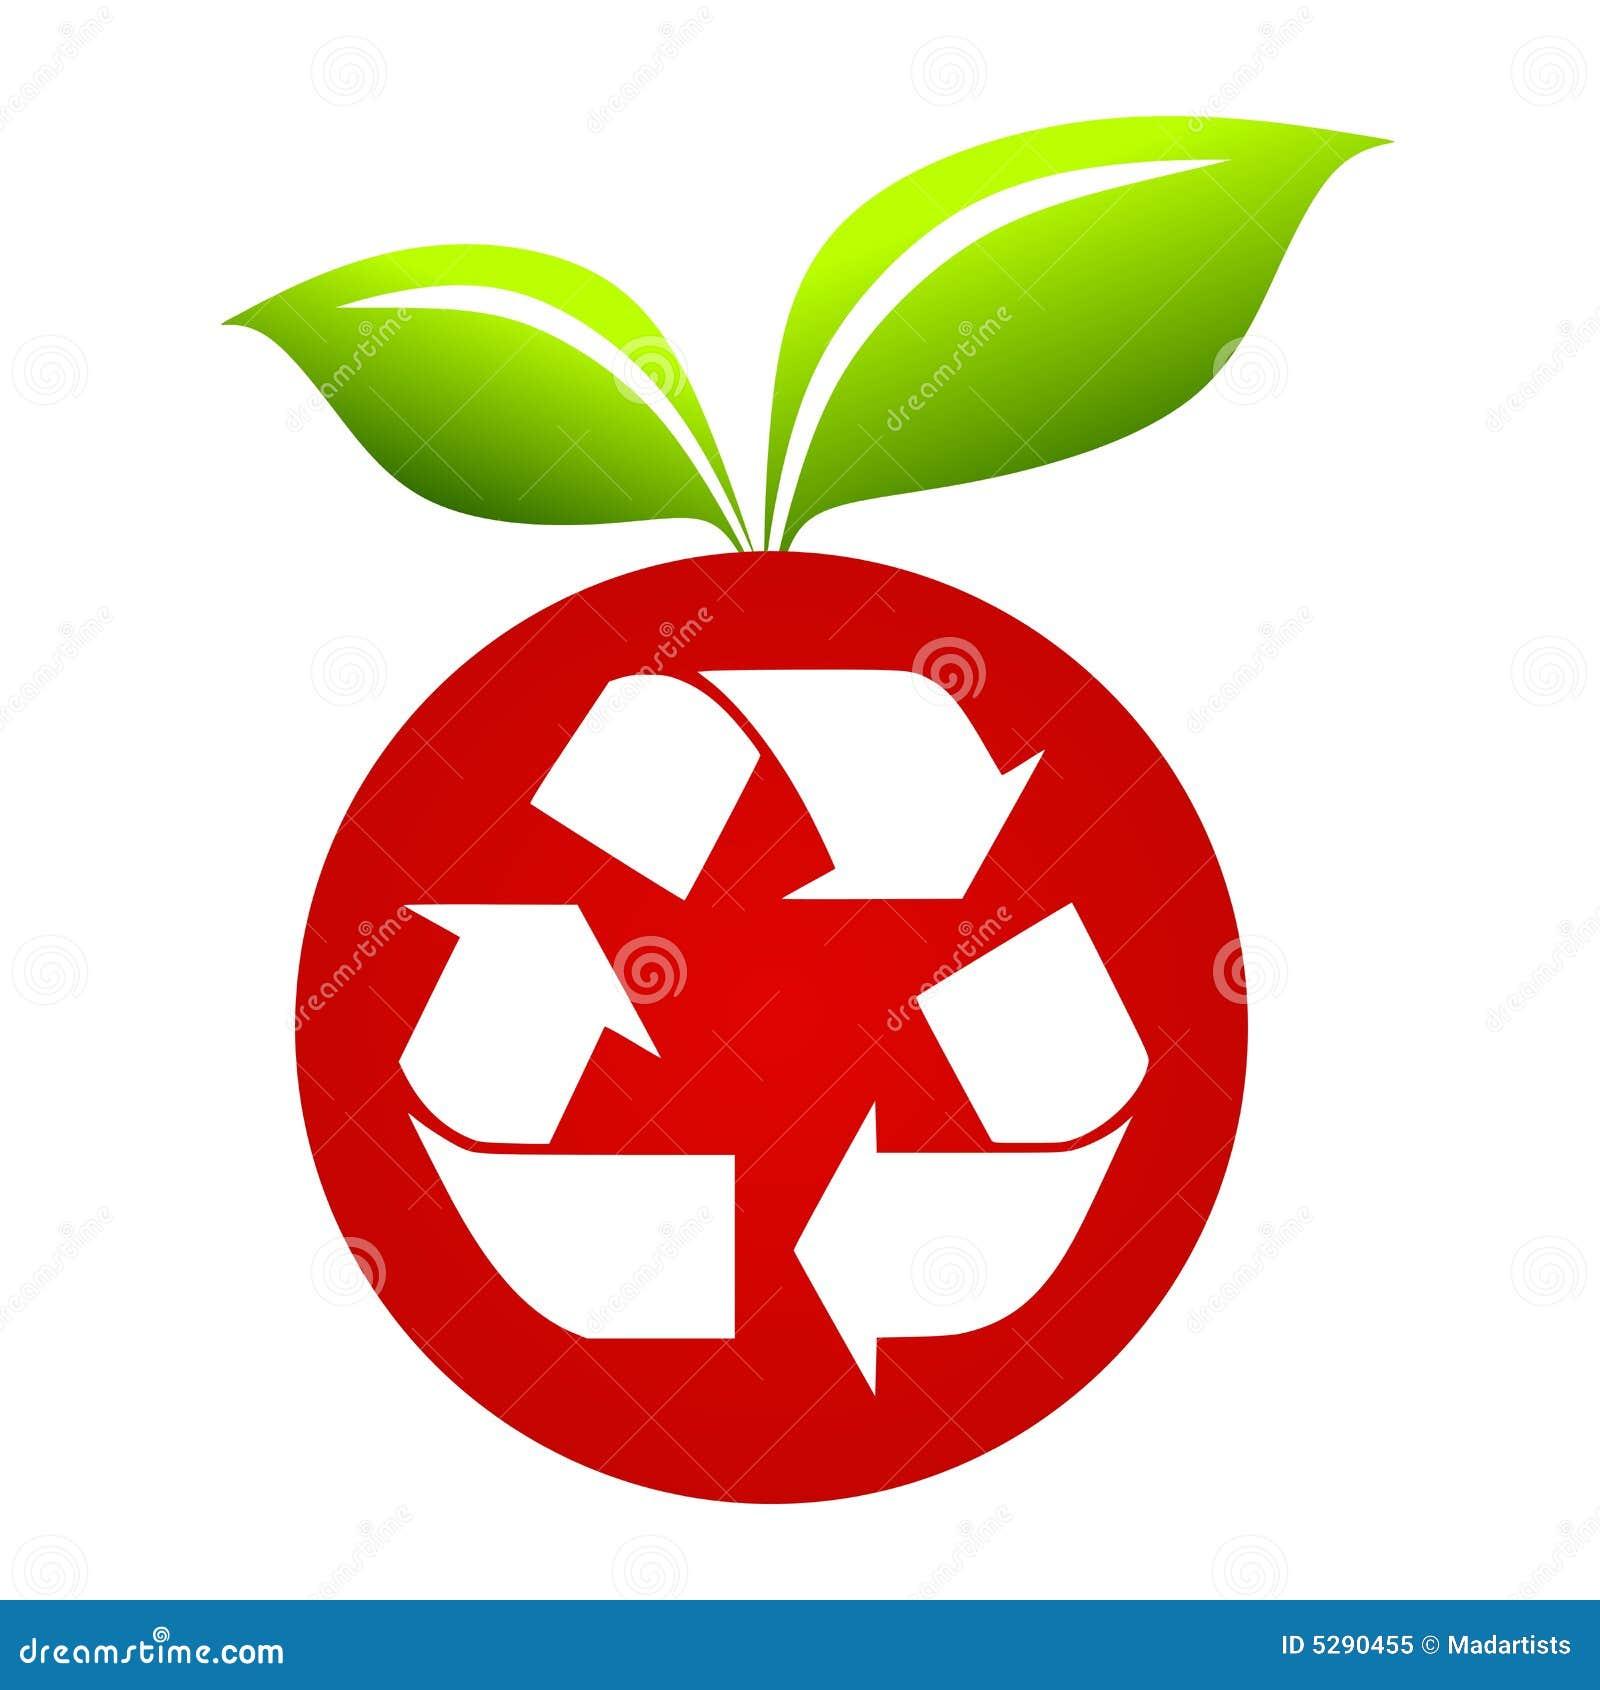 Recycle symbol on apple stock illustration illustration of recycle symbol on apple royalty free stock photo buycottarizona